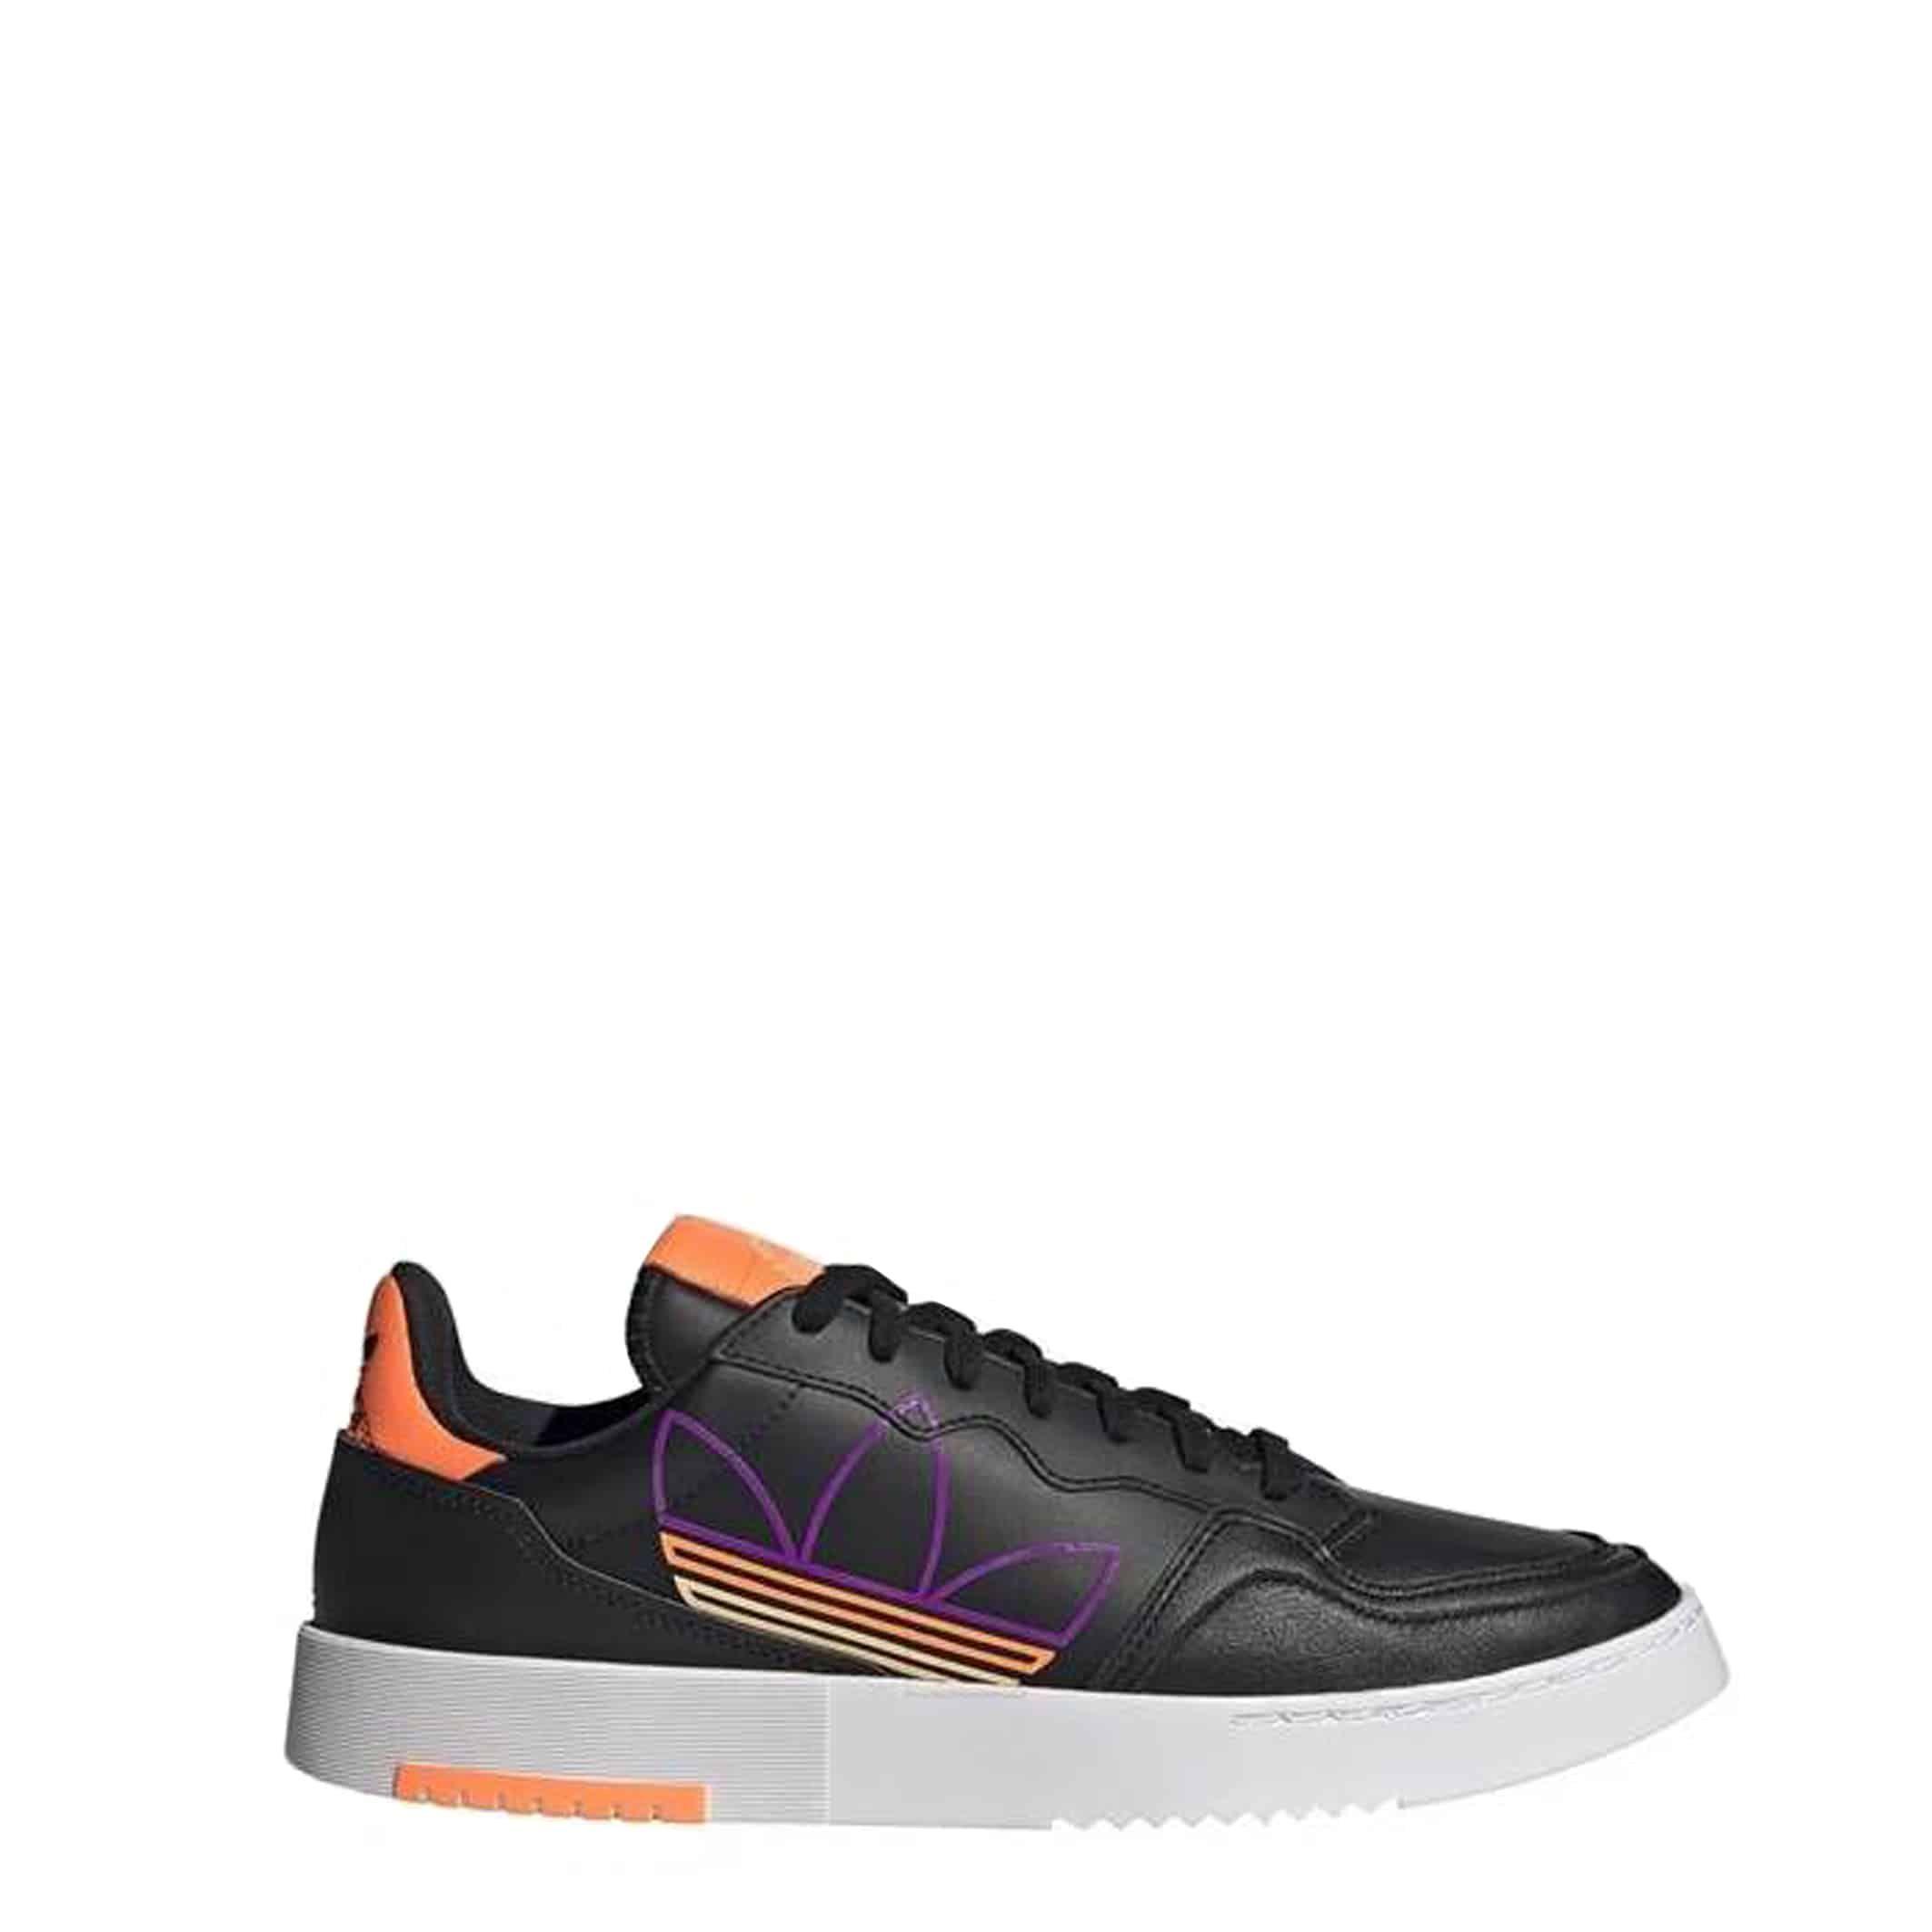 Adidas – Supercourt – Negro